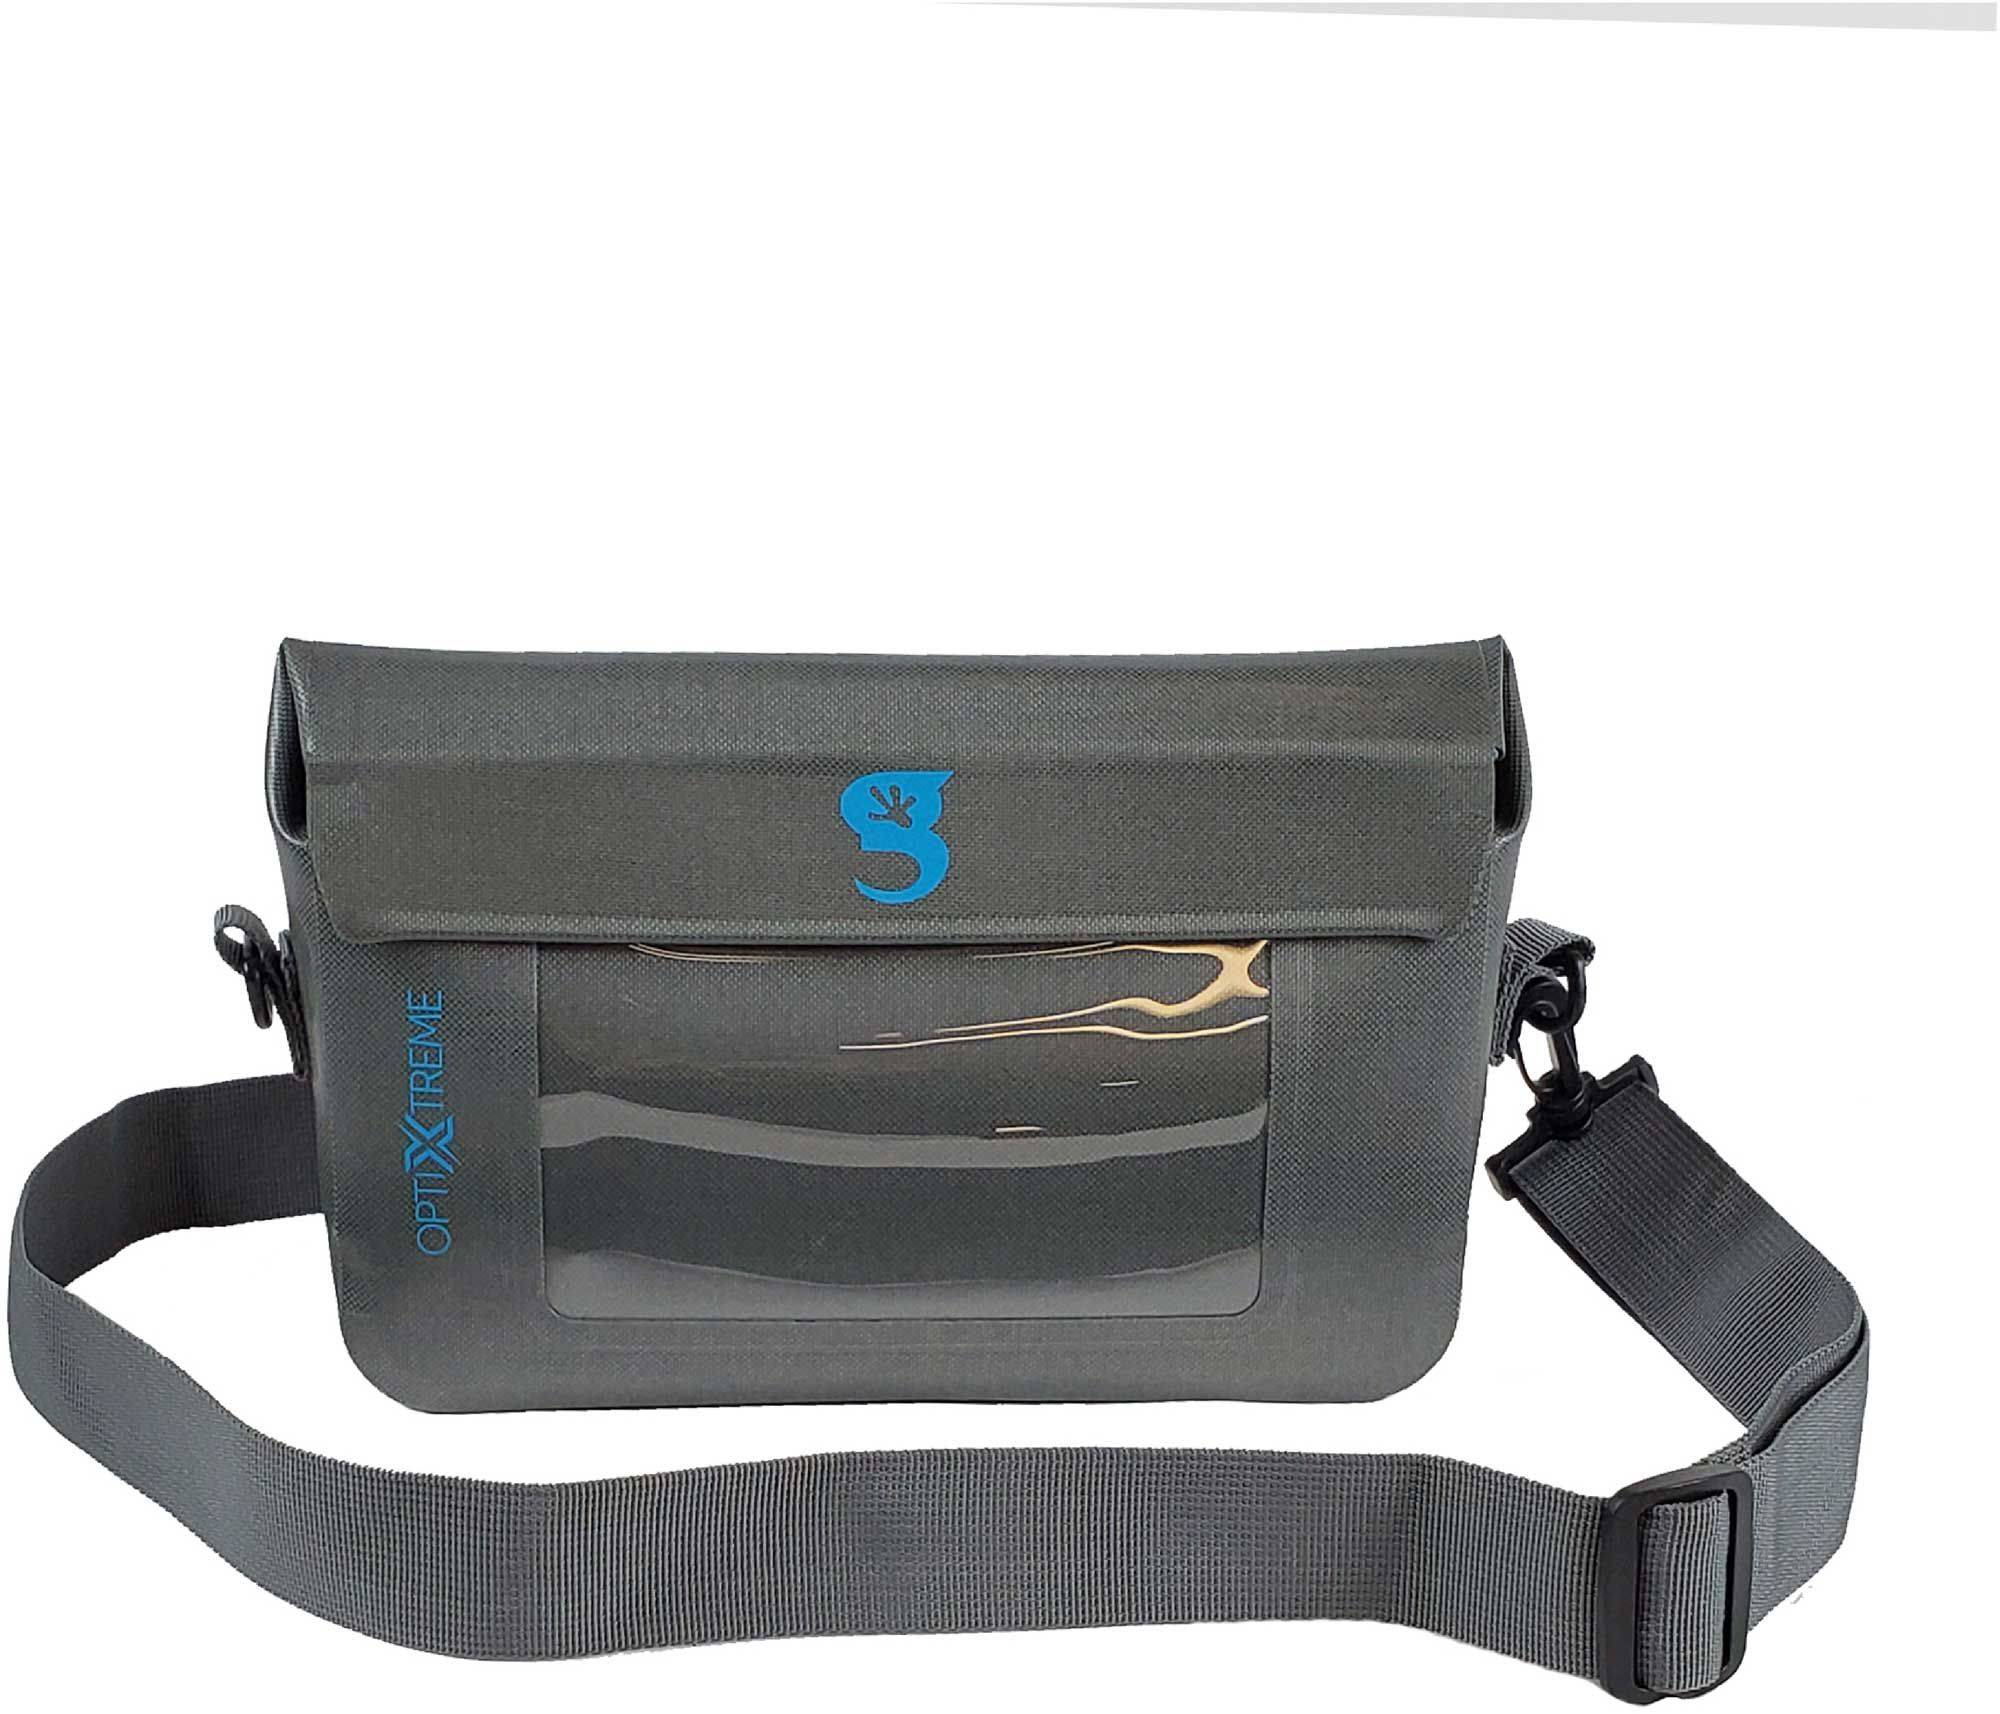 geckobrands Optixtreme Waterproof Phone Tote, Gray